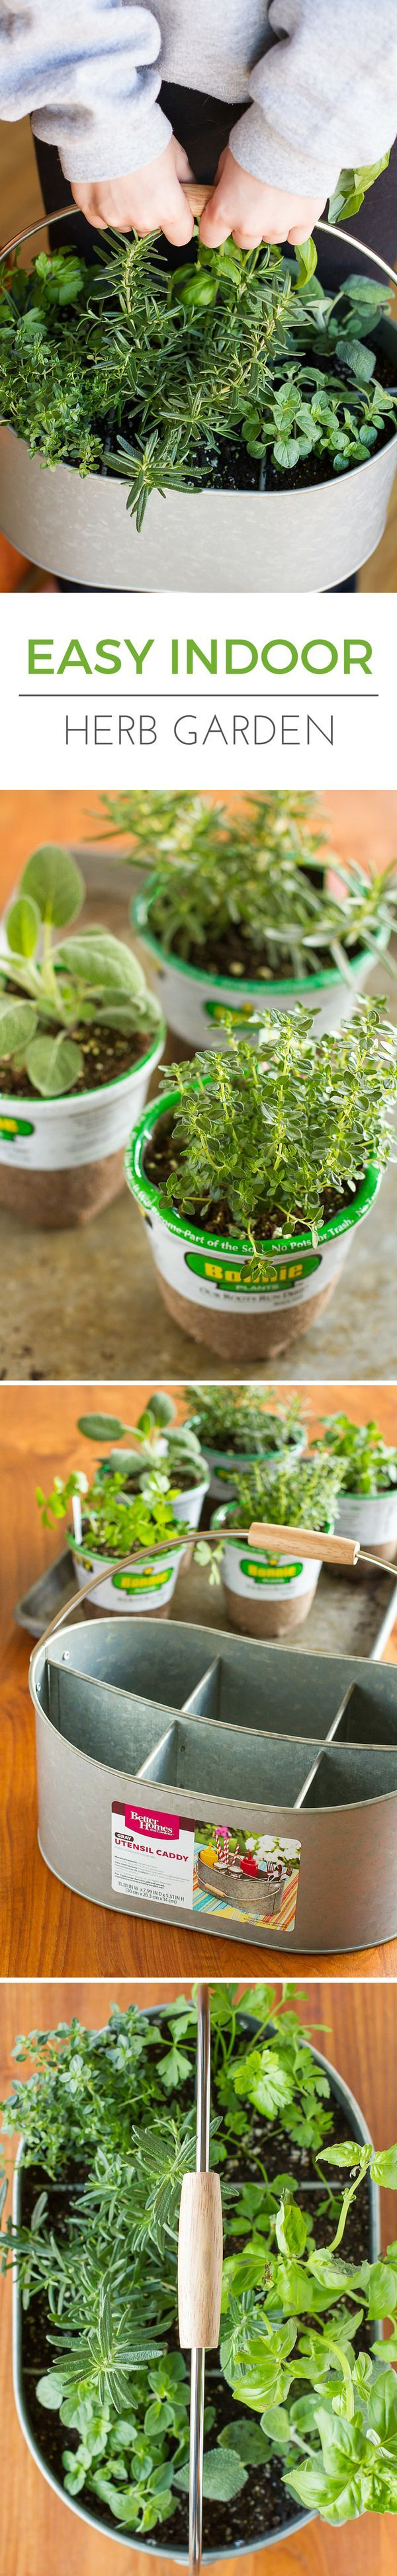 best 25+ herb pots ideas only on pinterest | diy herb garden